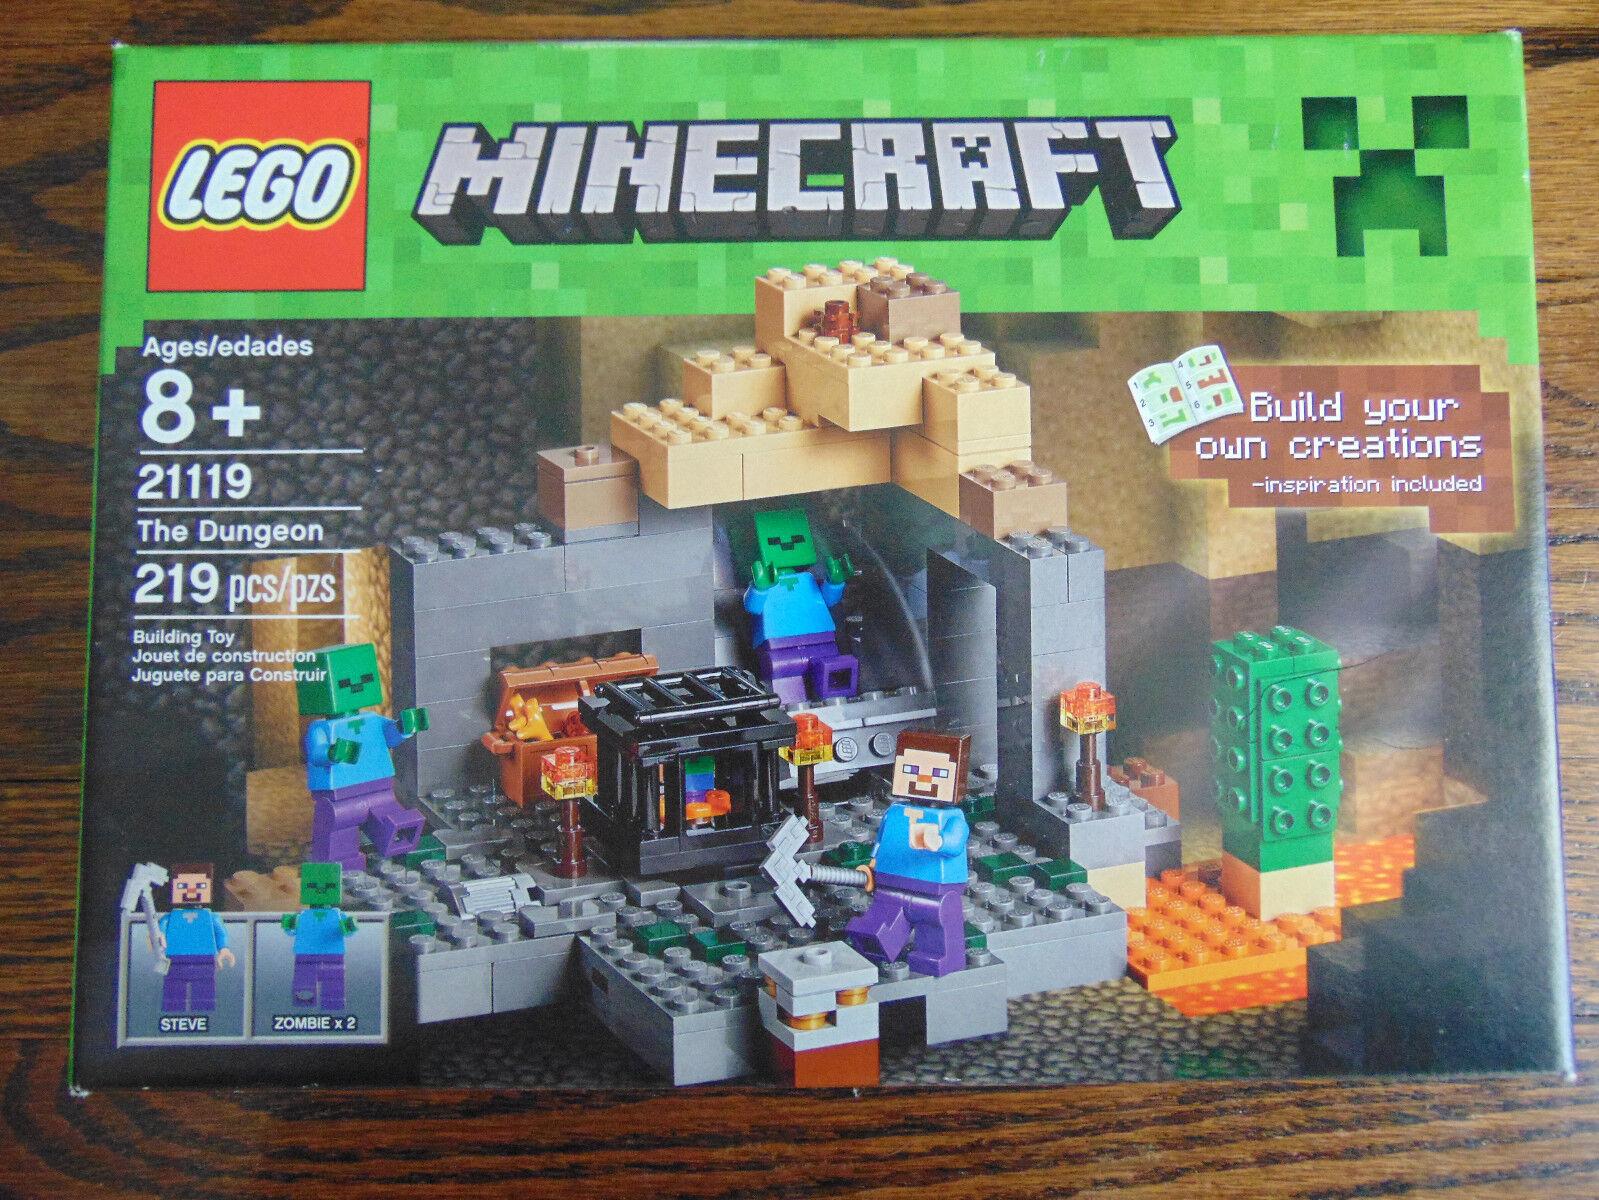 LEGO 21119 MINECRAFT MINECRAFT MINECRAFT THE DUNGEON 219pcs. AGES 8+ NEW SEALED fc777c